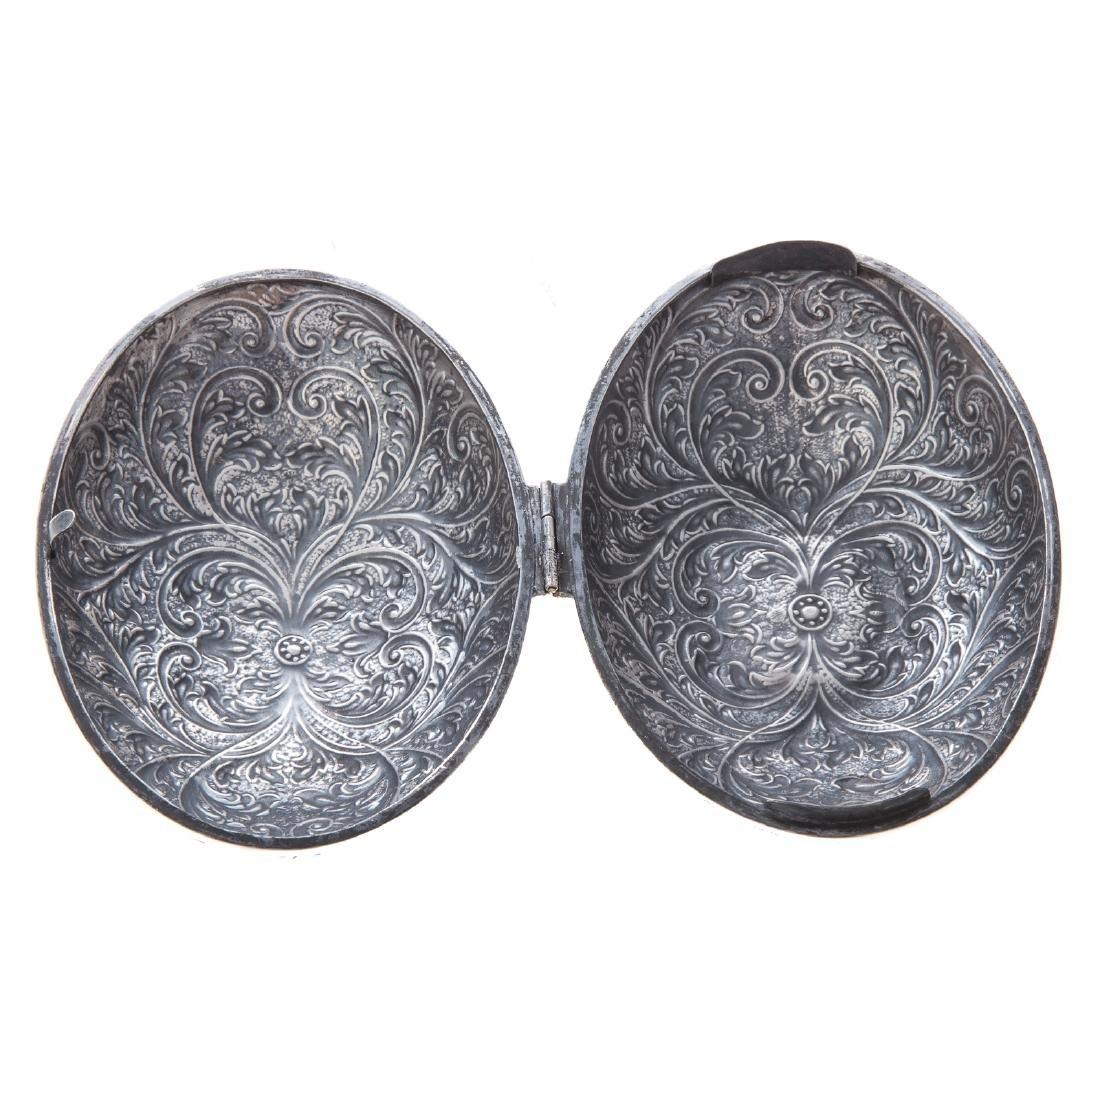 Continental silver hinged box - 2